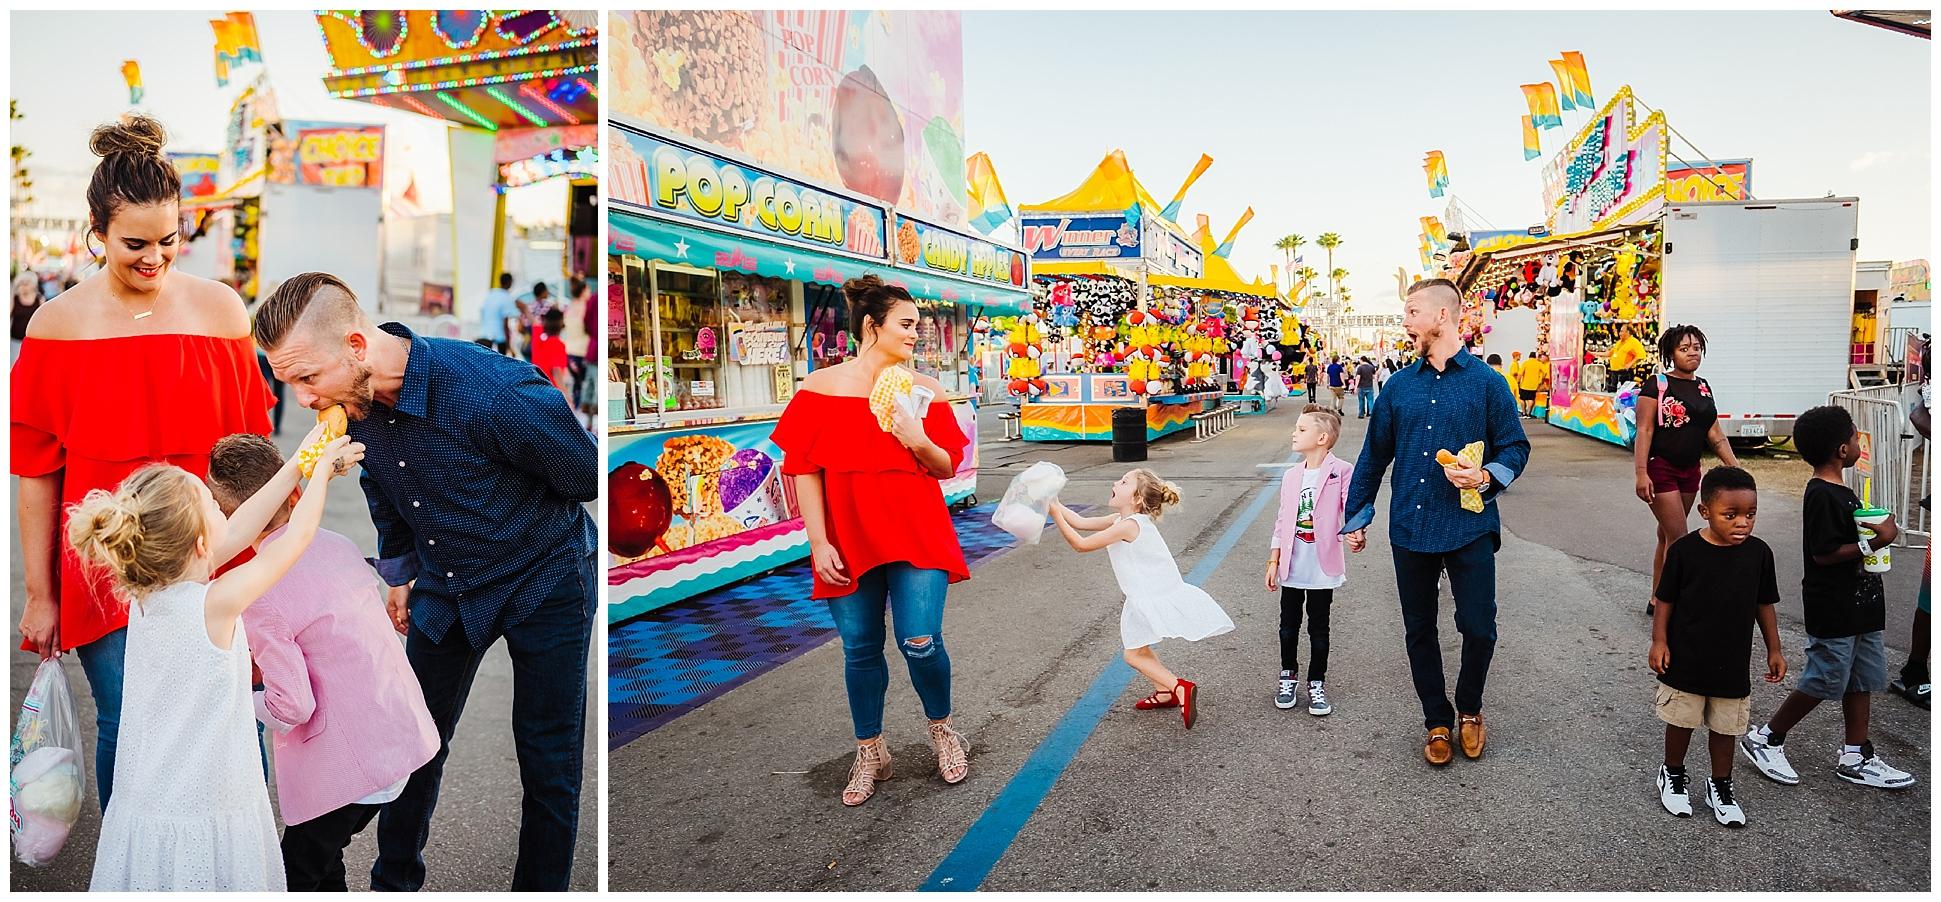 Tampa-colorful-fair-amusement park-family session_0027.jpg